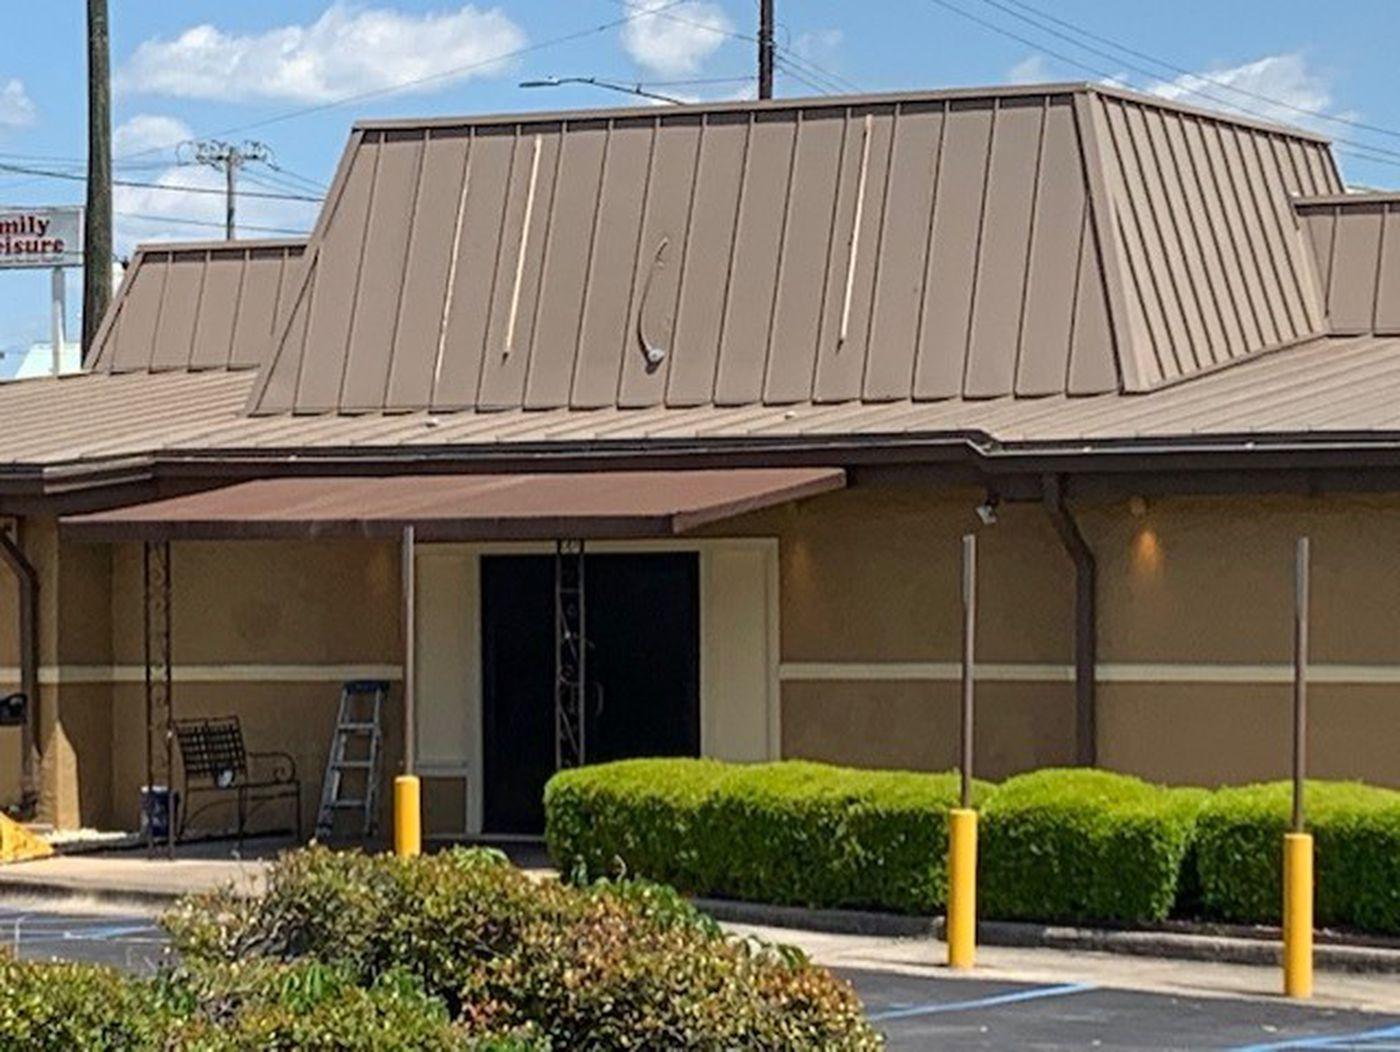 Birmingham Olive Garden Restaurant Closing Permanently